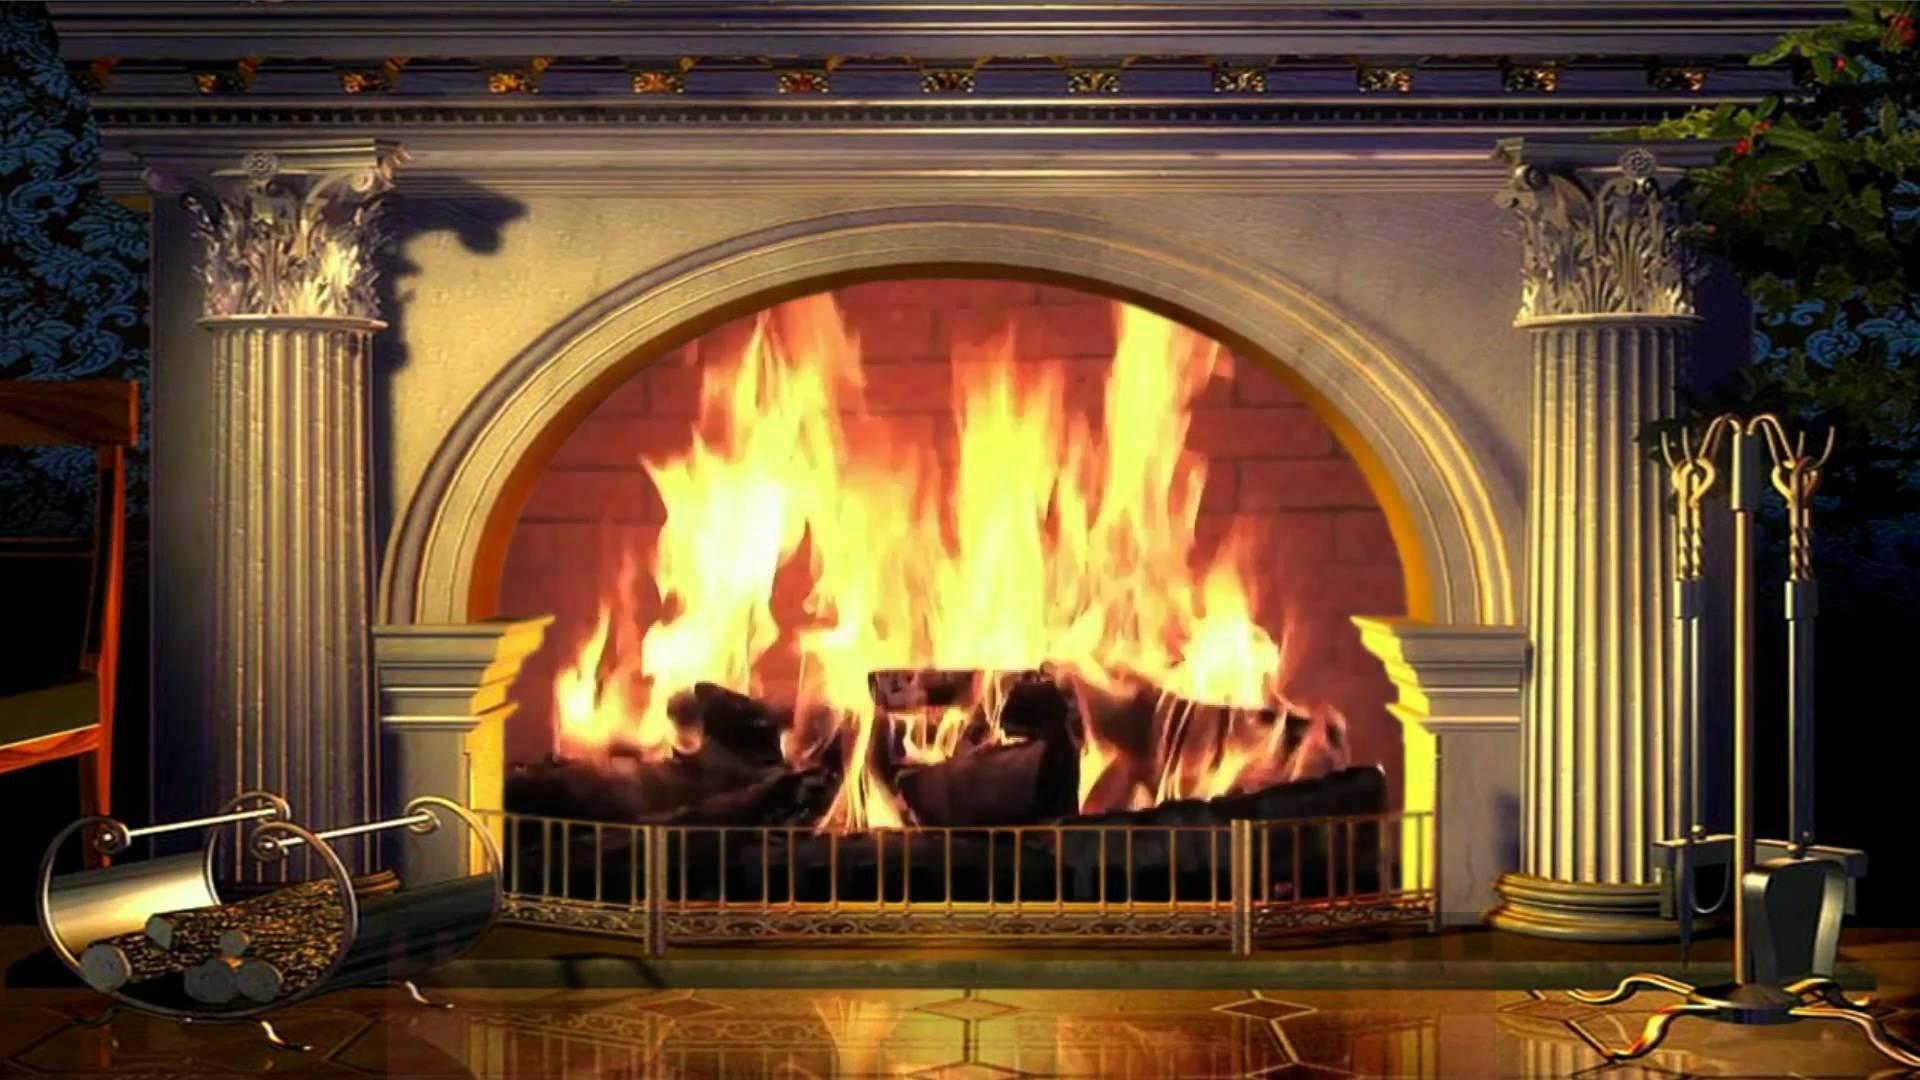 Fireplace Background 1 Download Free Beautiful Full Hd